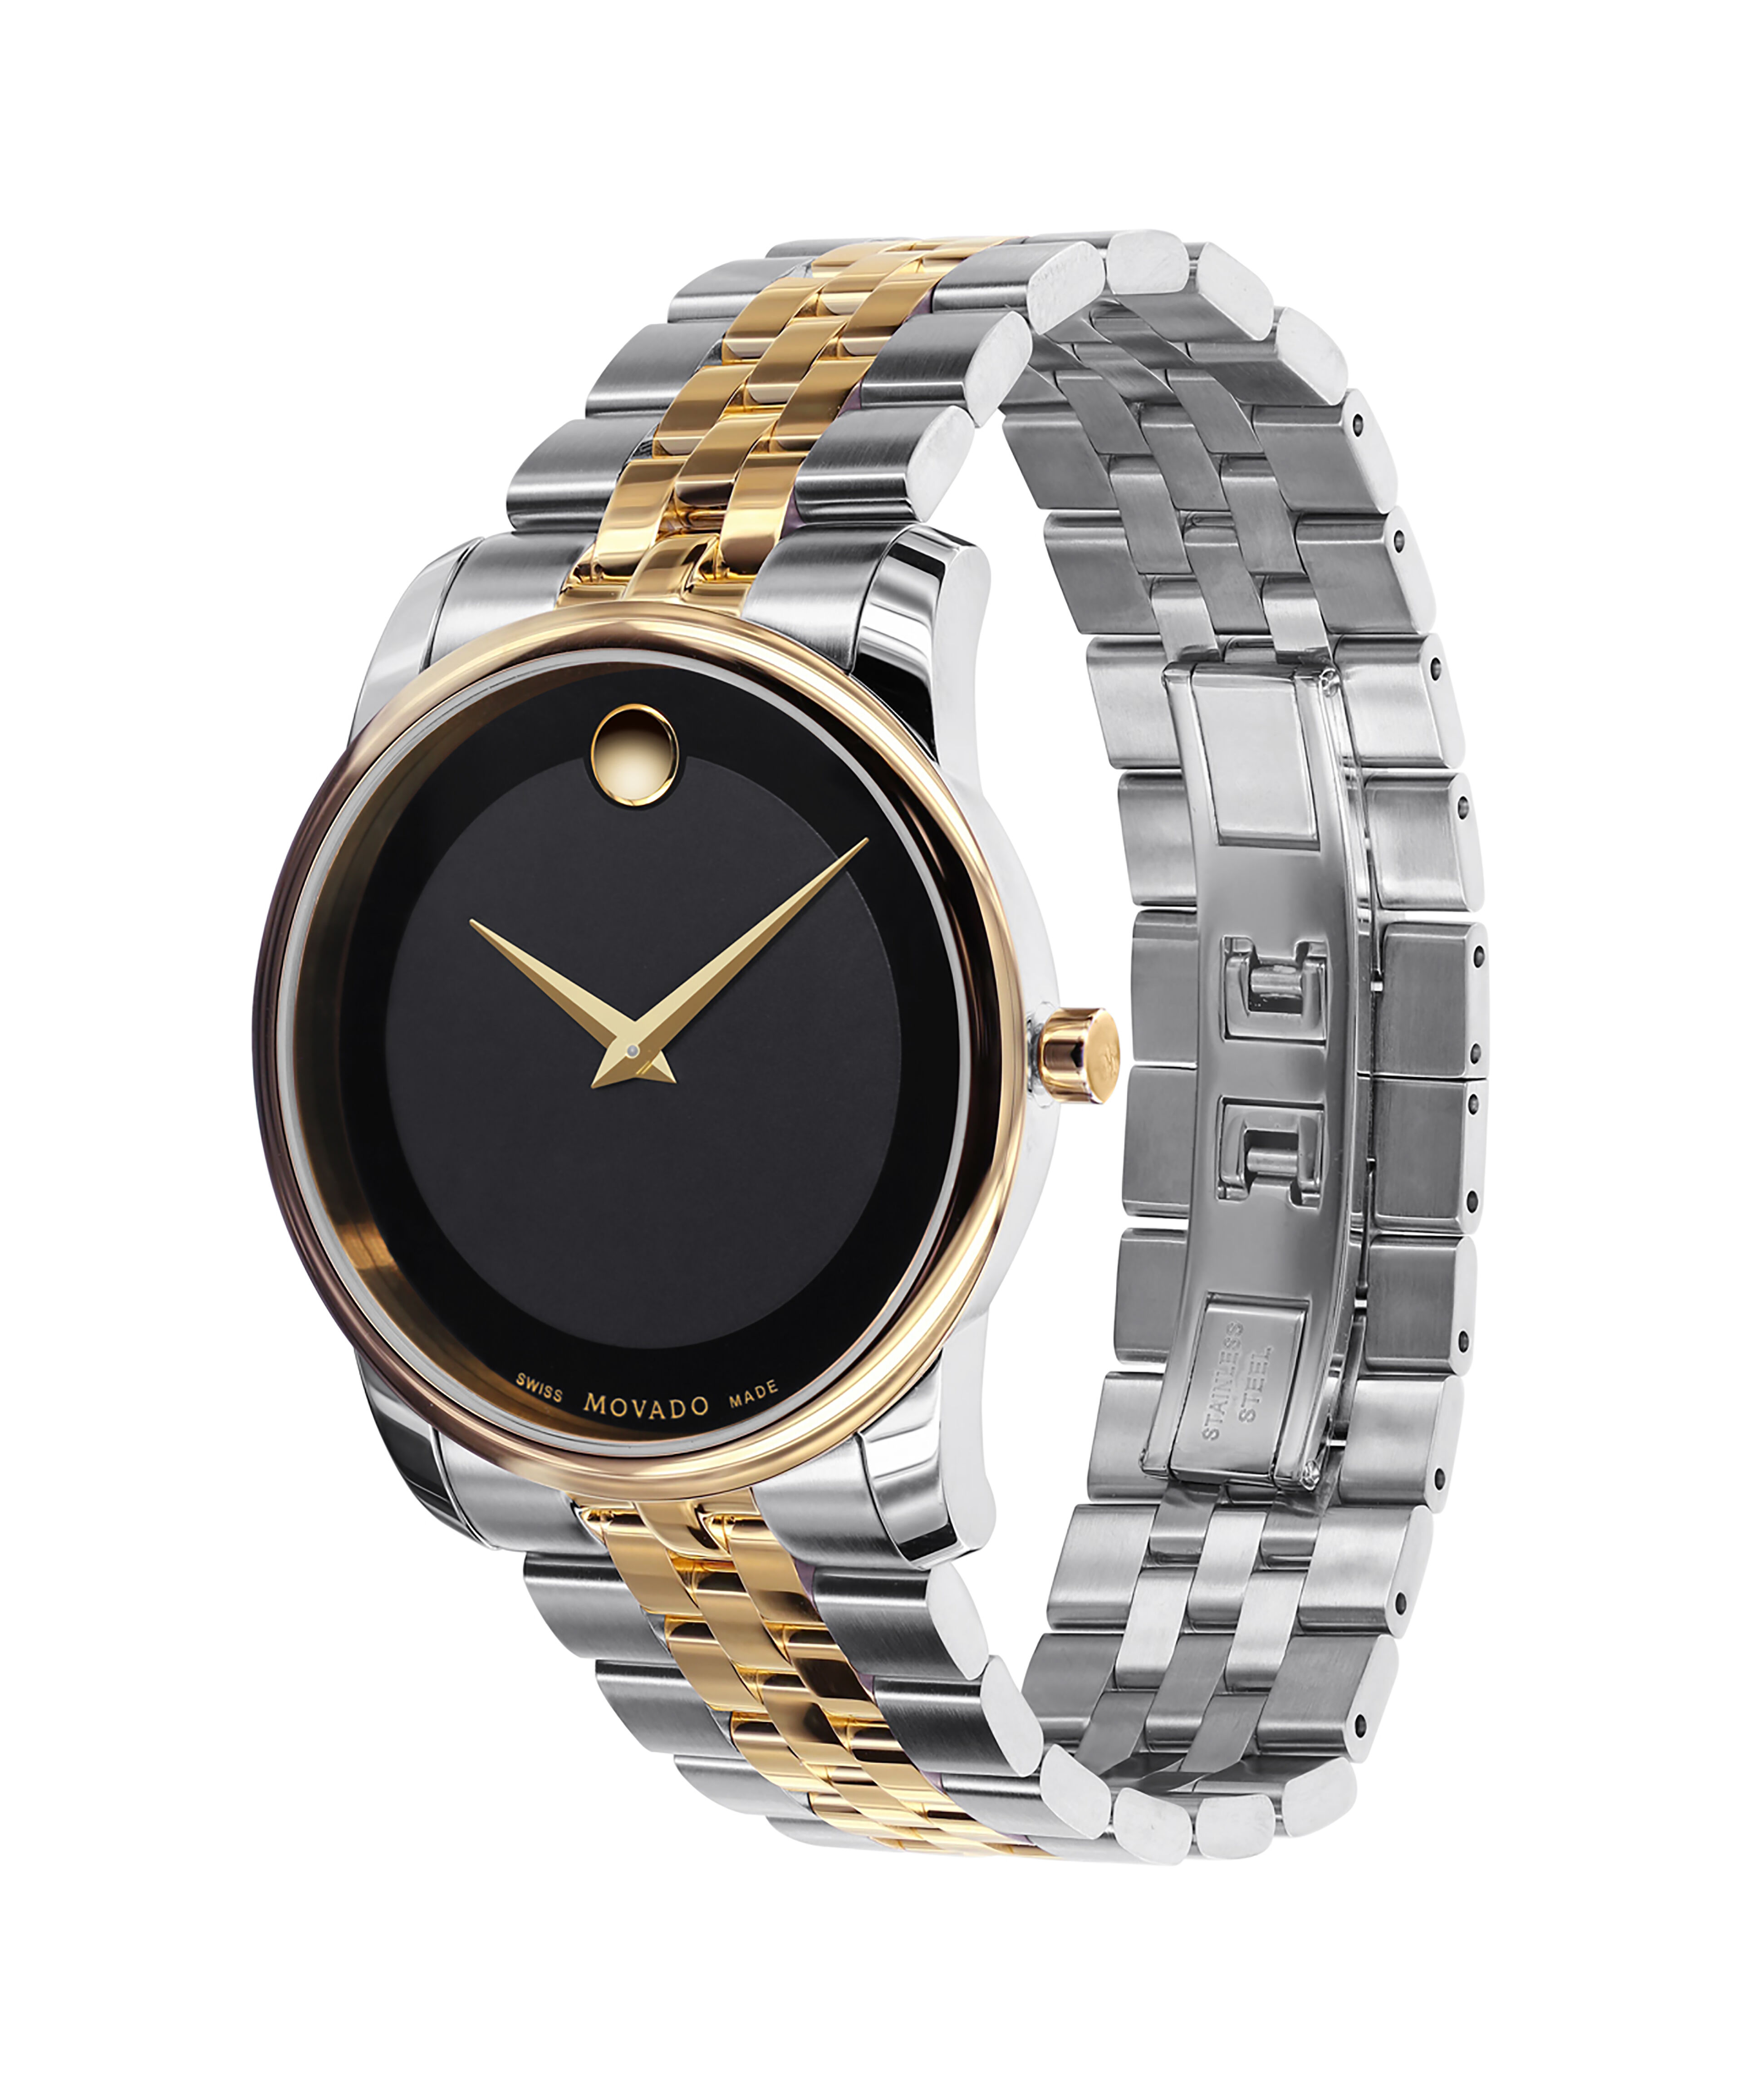 Replica Hublot Mp Watches